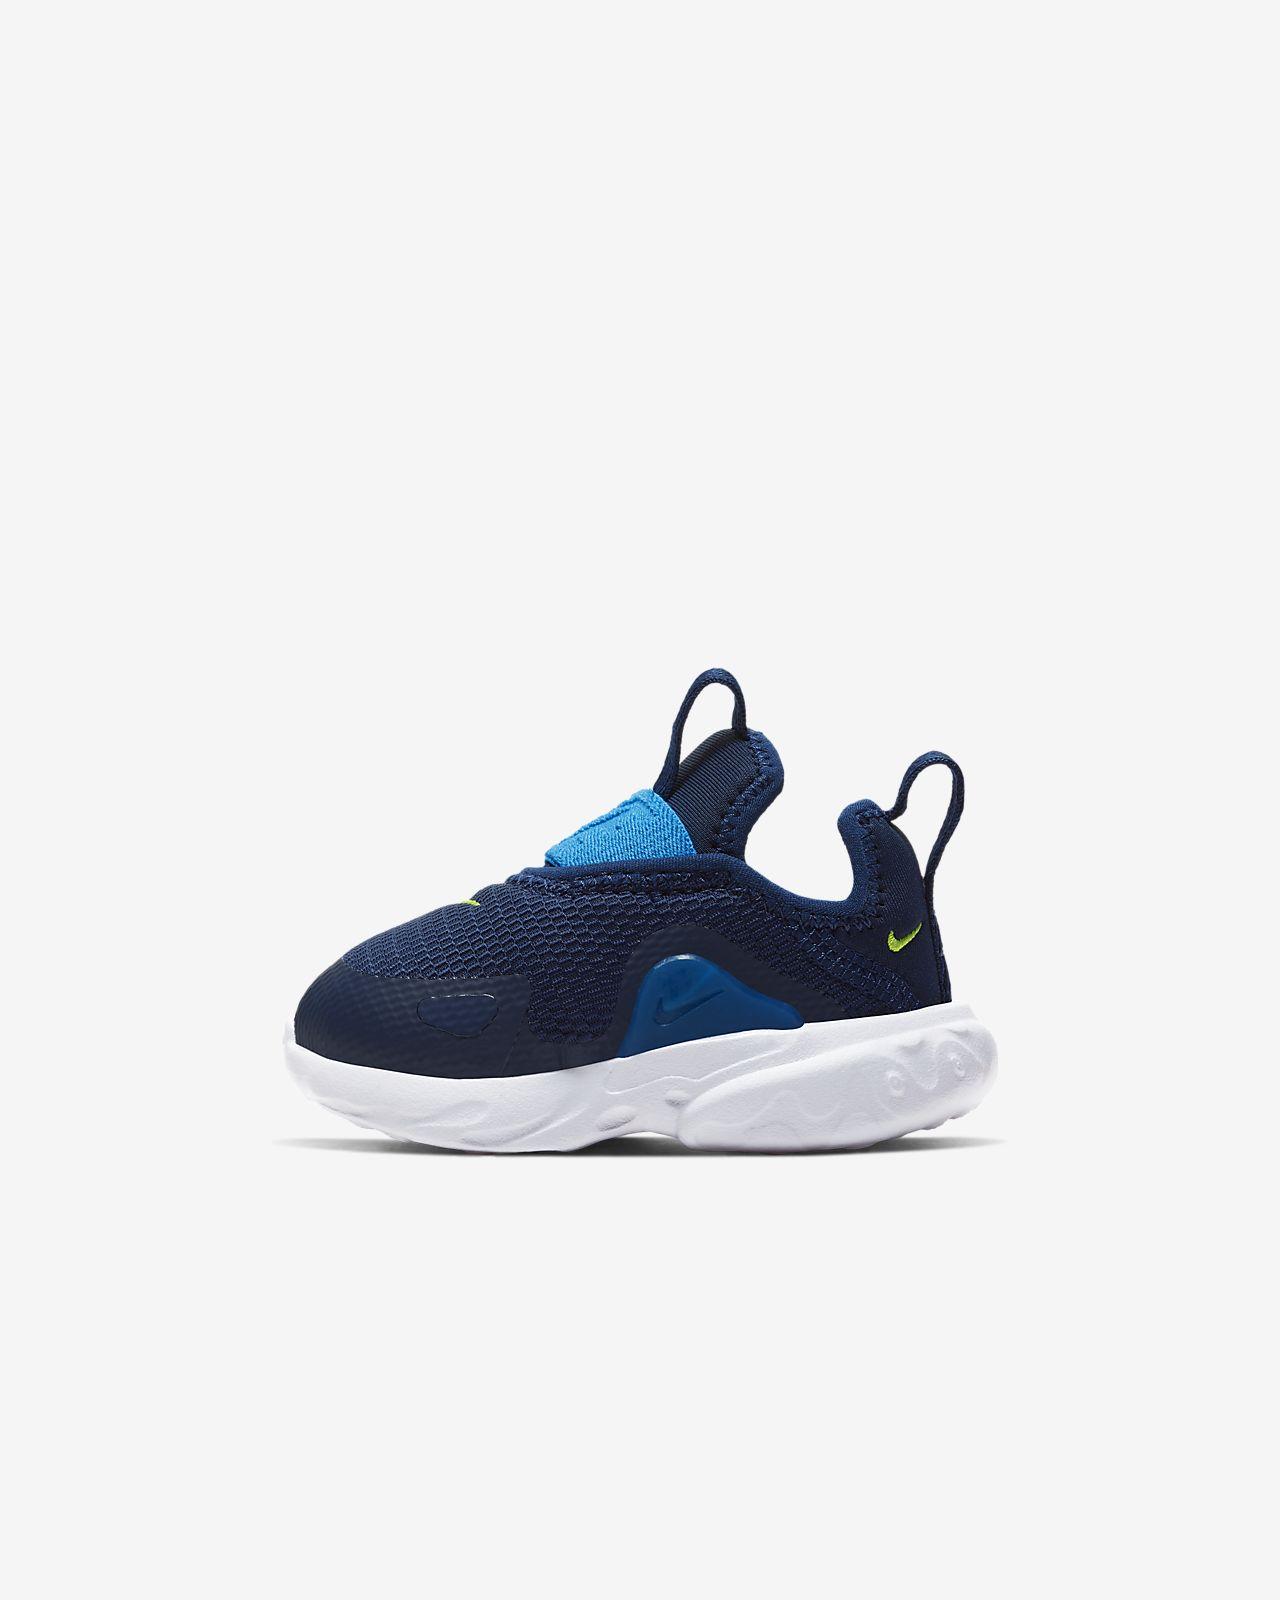 Nike RT Presto Extreme Baby/Toddler Shoe